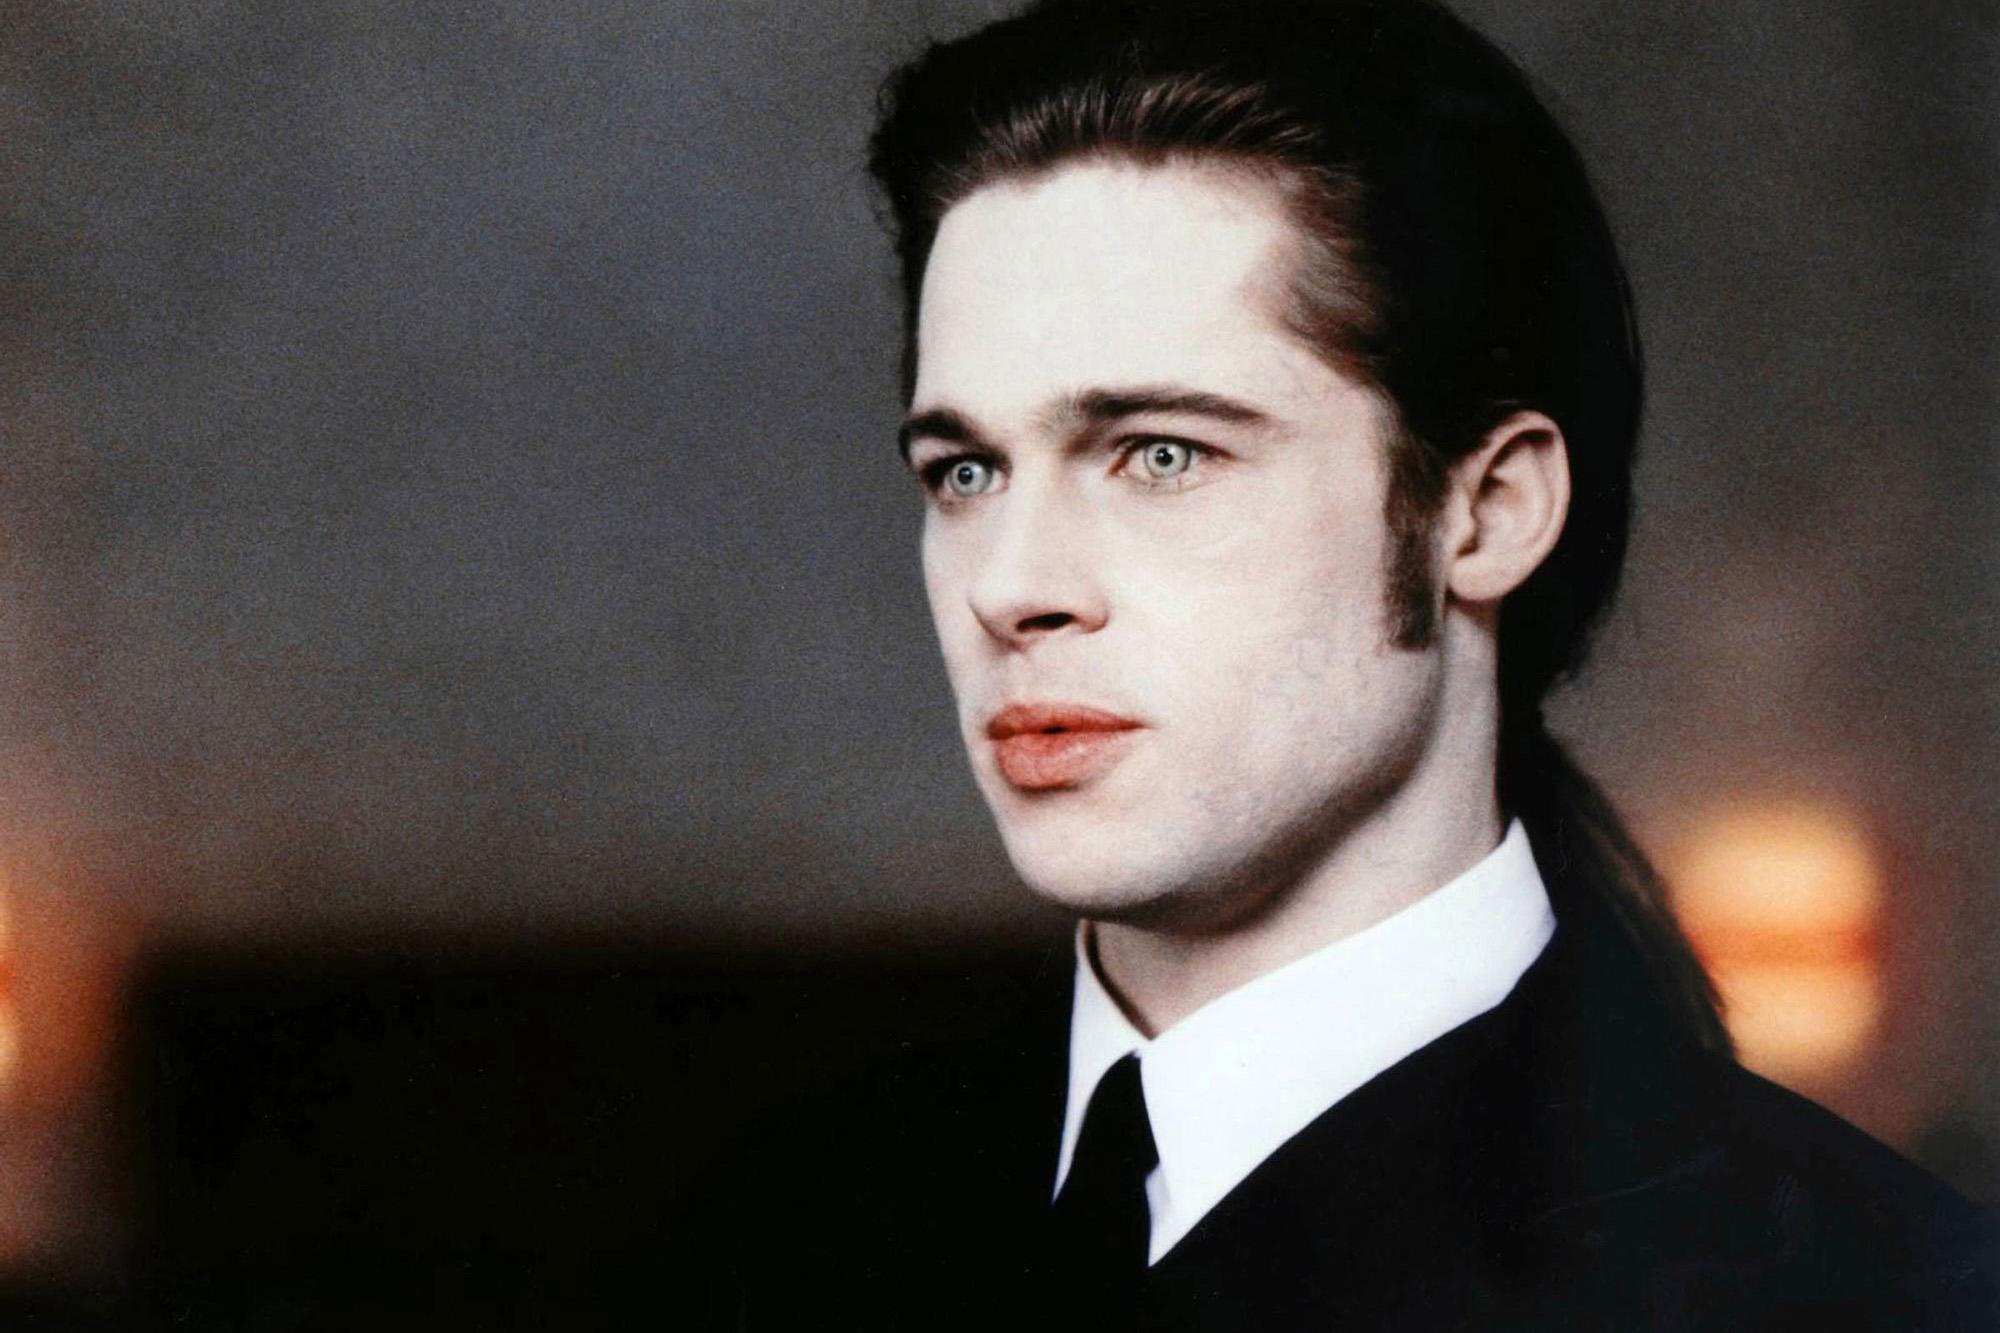 самые стильные вампиры луи лестат брэд питт том круз интервью с вампиром interview with the vampire